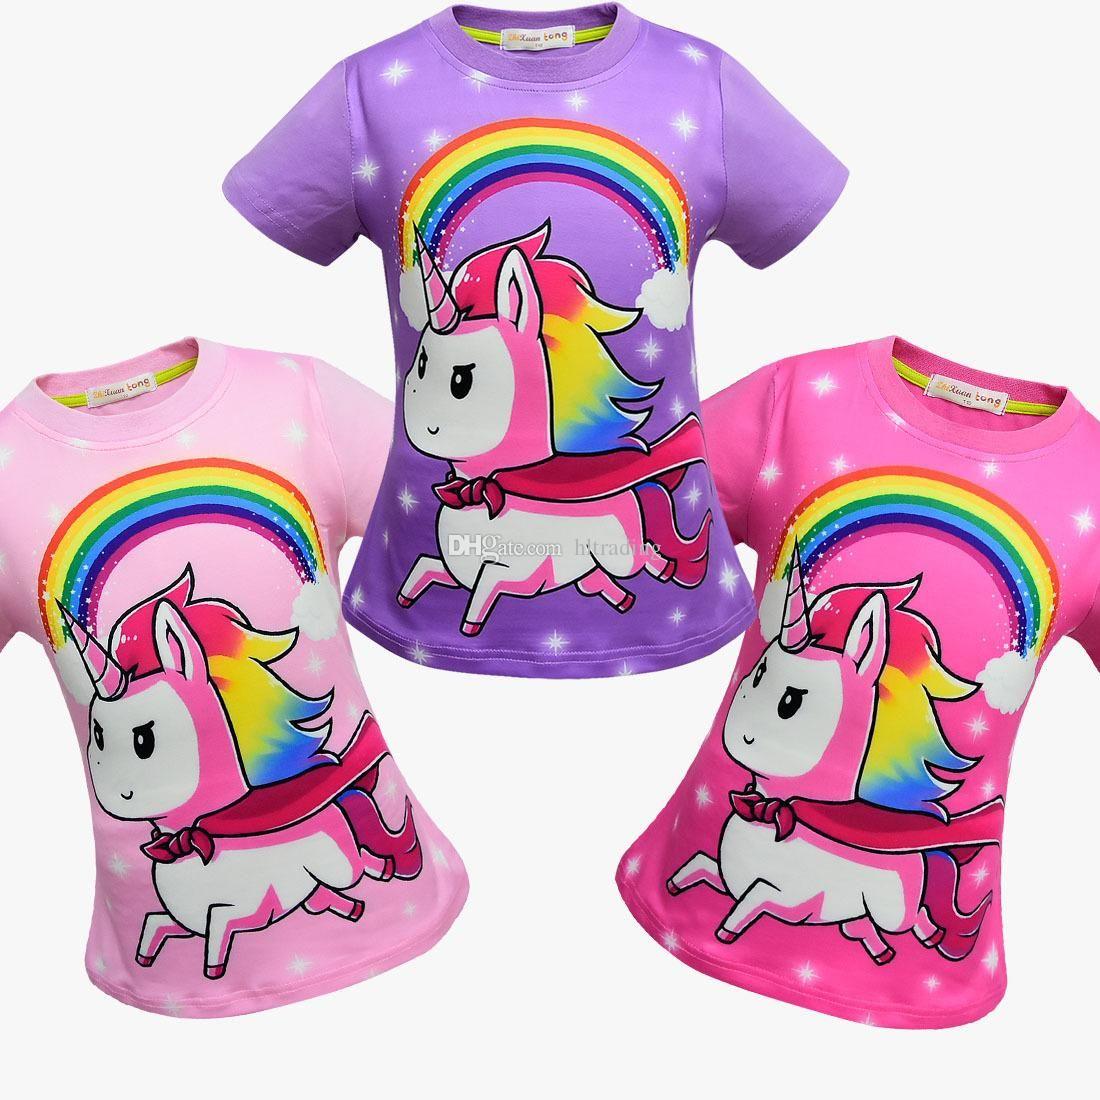 3c52be636a540 Baby girls unicorn print T-shirts 2018 summer shirt Tops cotton children  Tees kids Clothing 12 colors DHL C5581